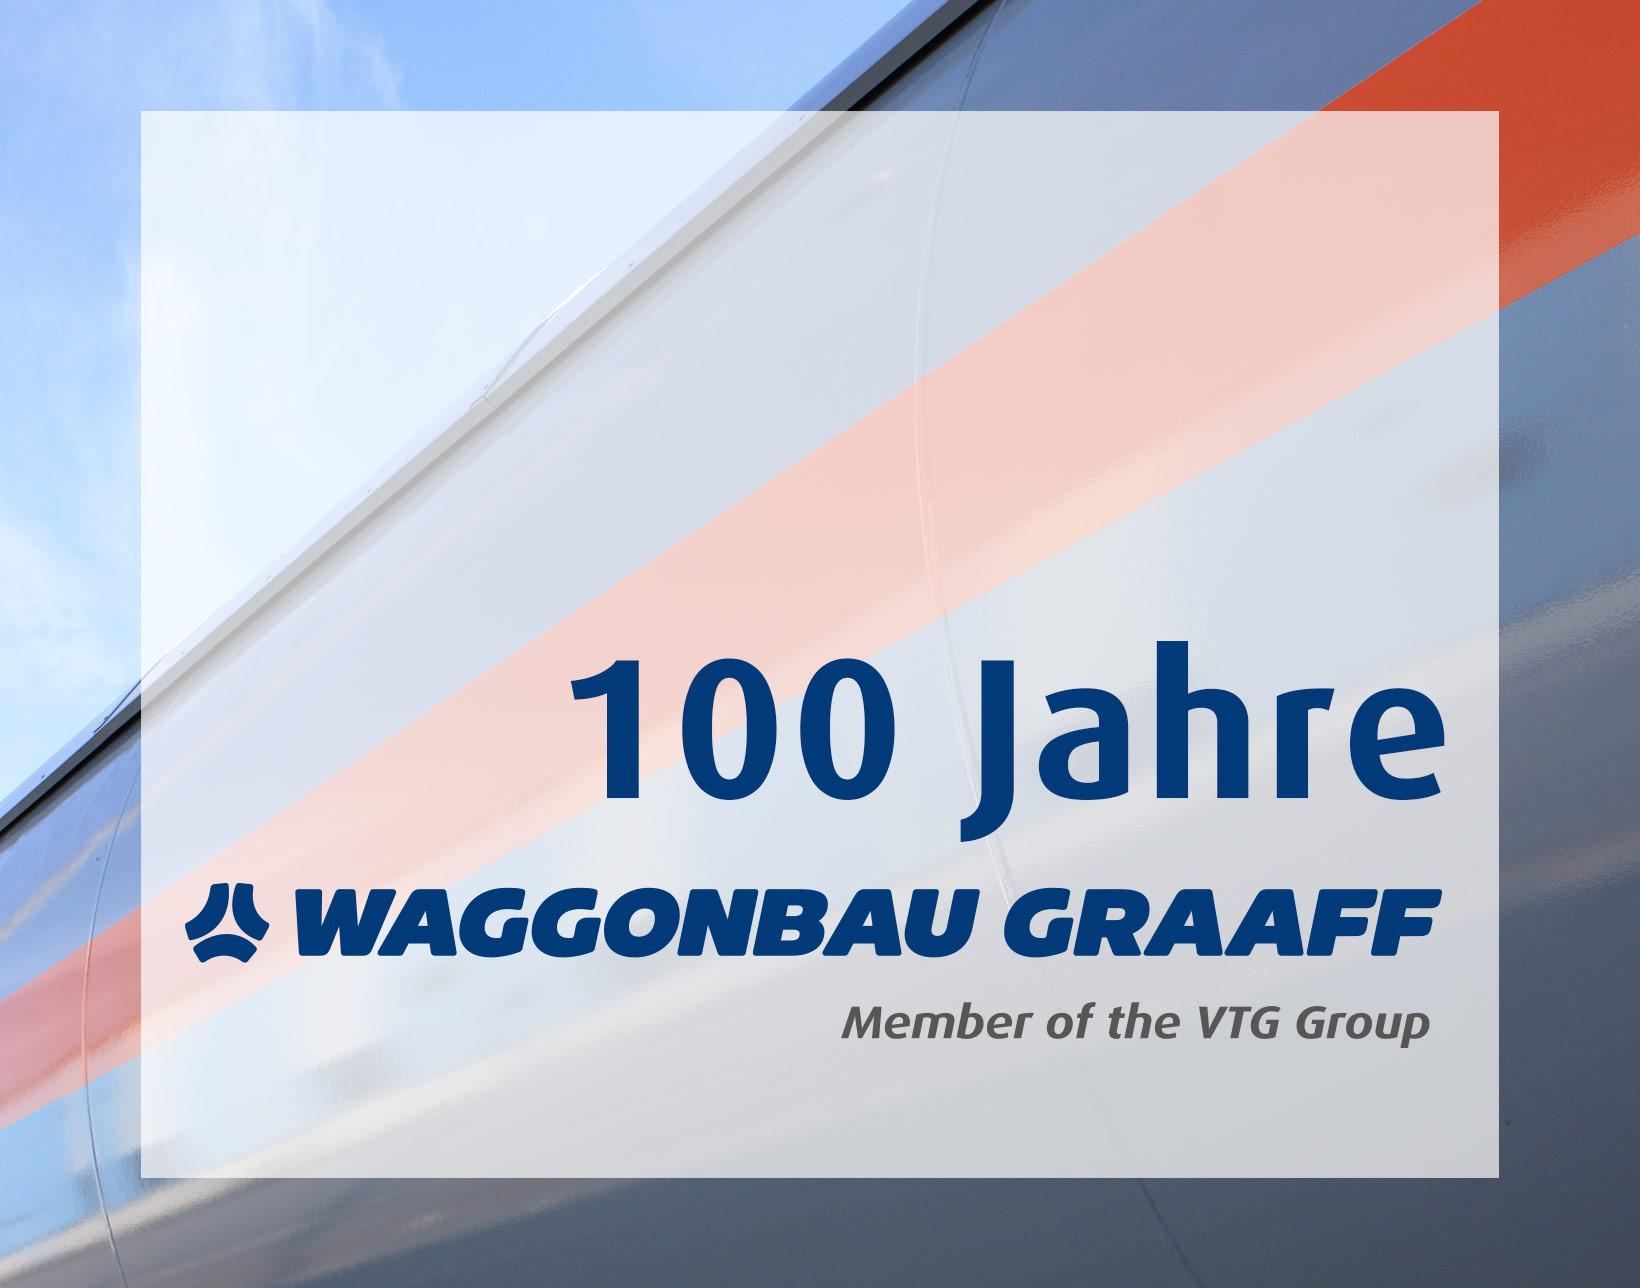 Schriftzug 100 Jahre Waggonbau Graaff Member of the VTG Group